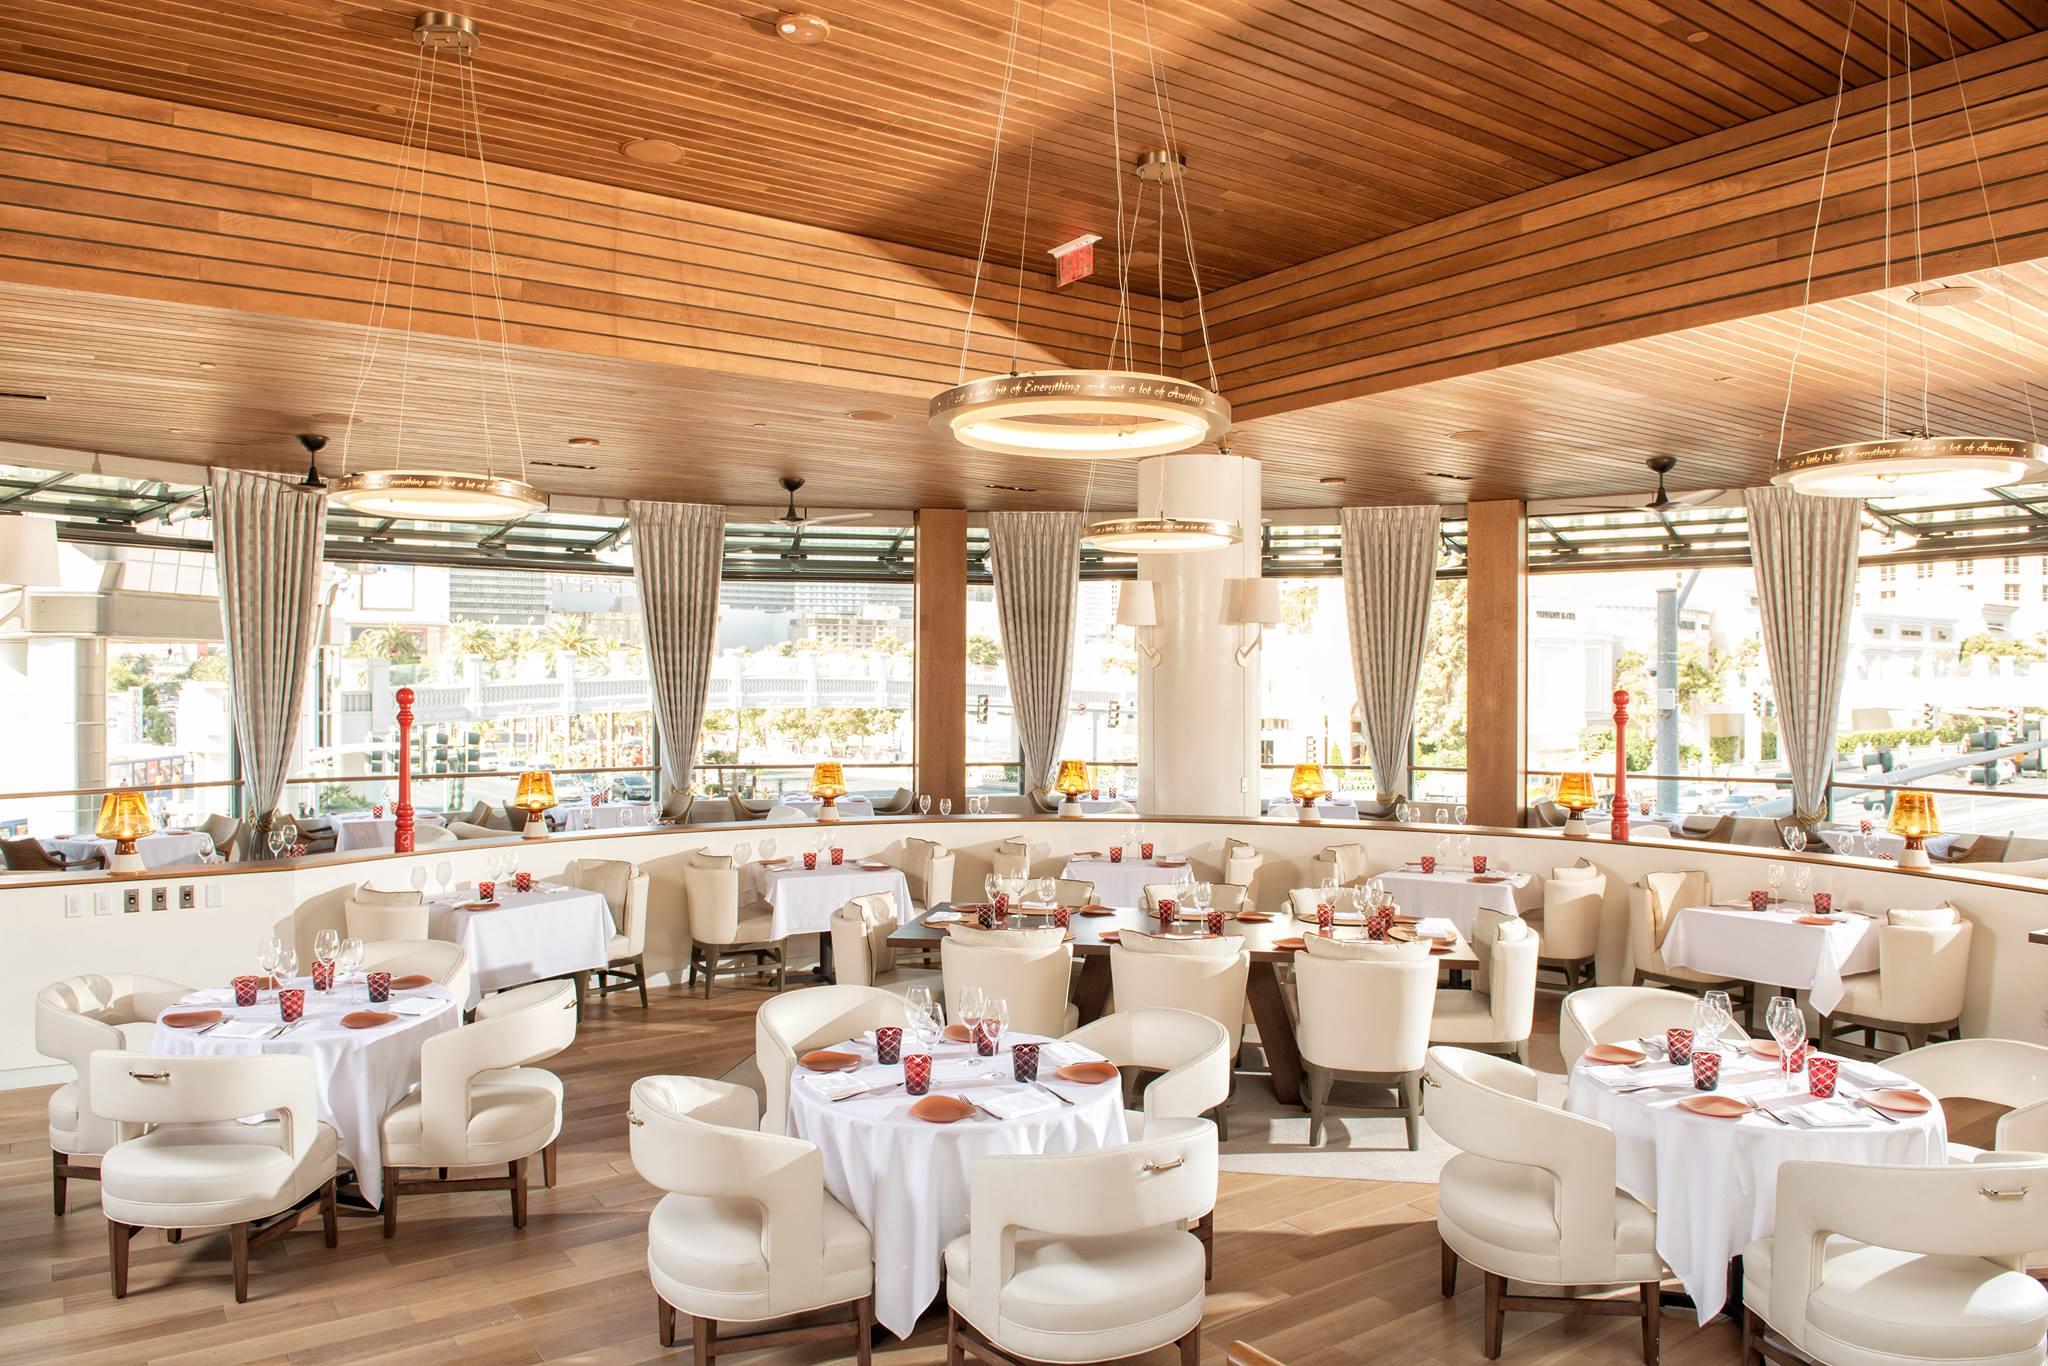 Giada's Las Vegas at The Cromwell